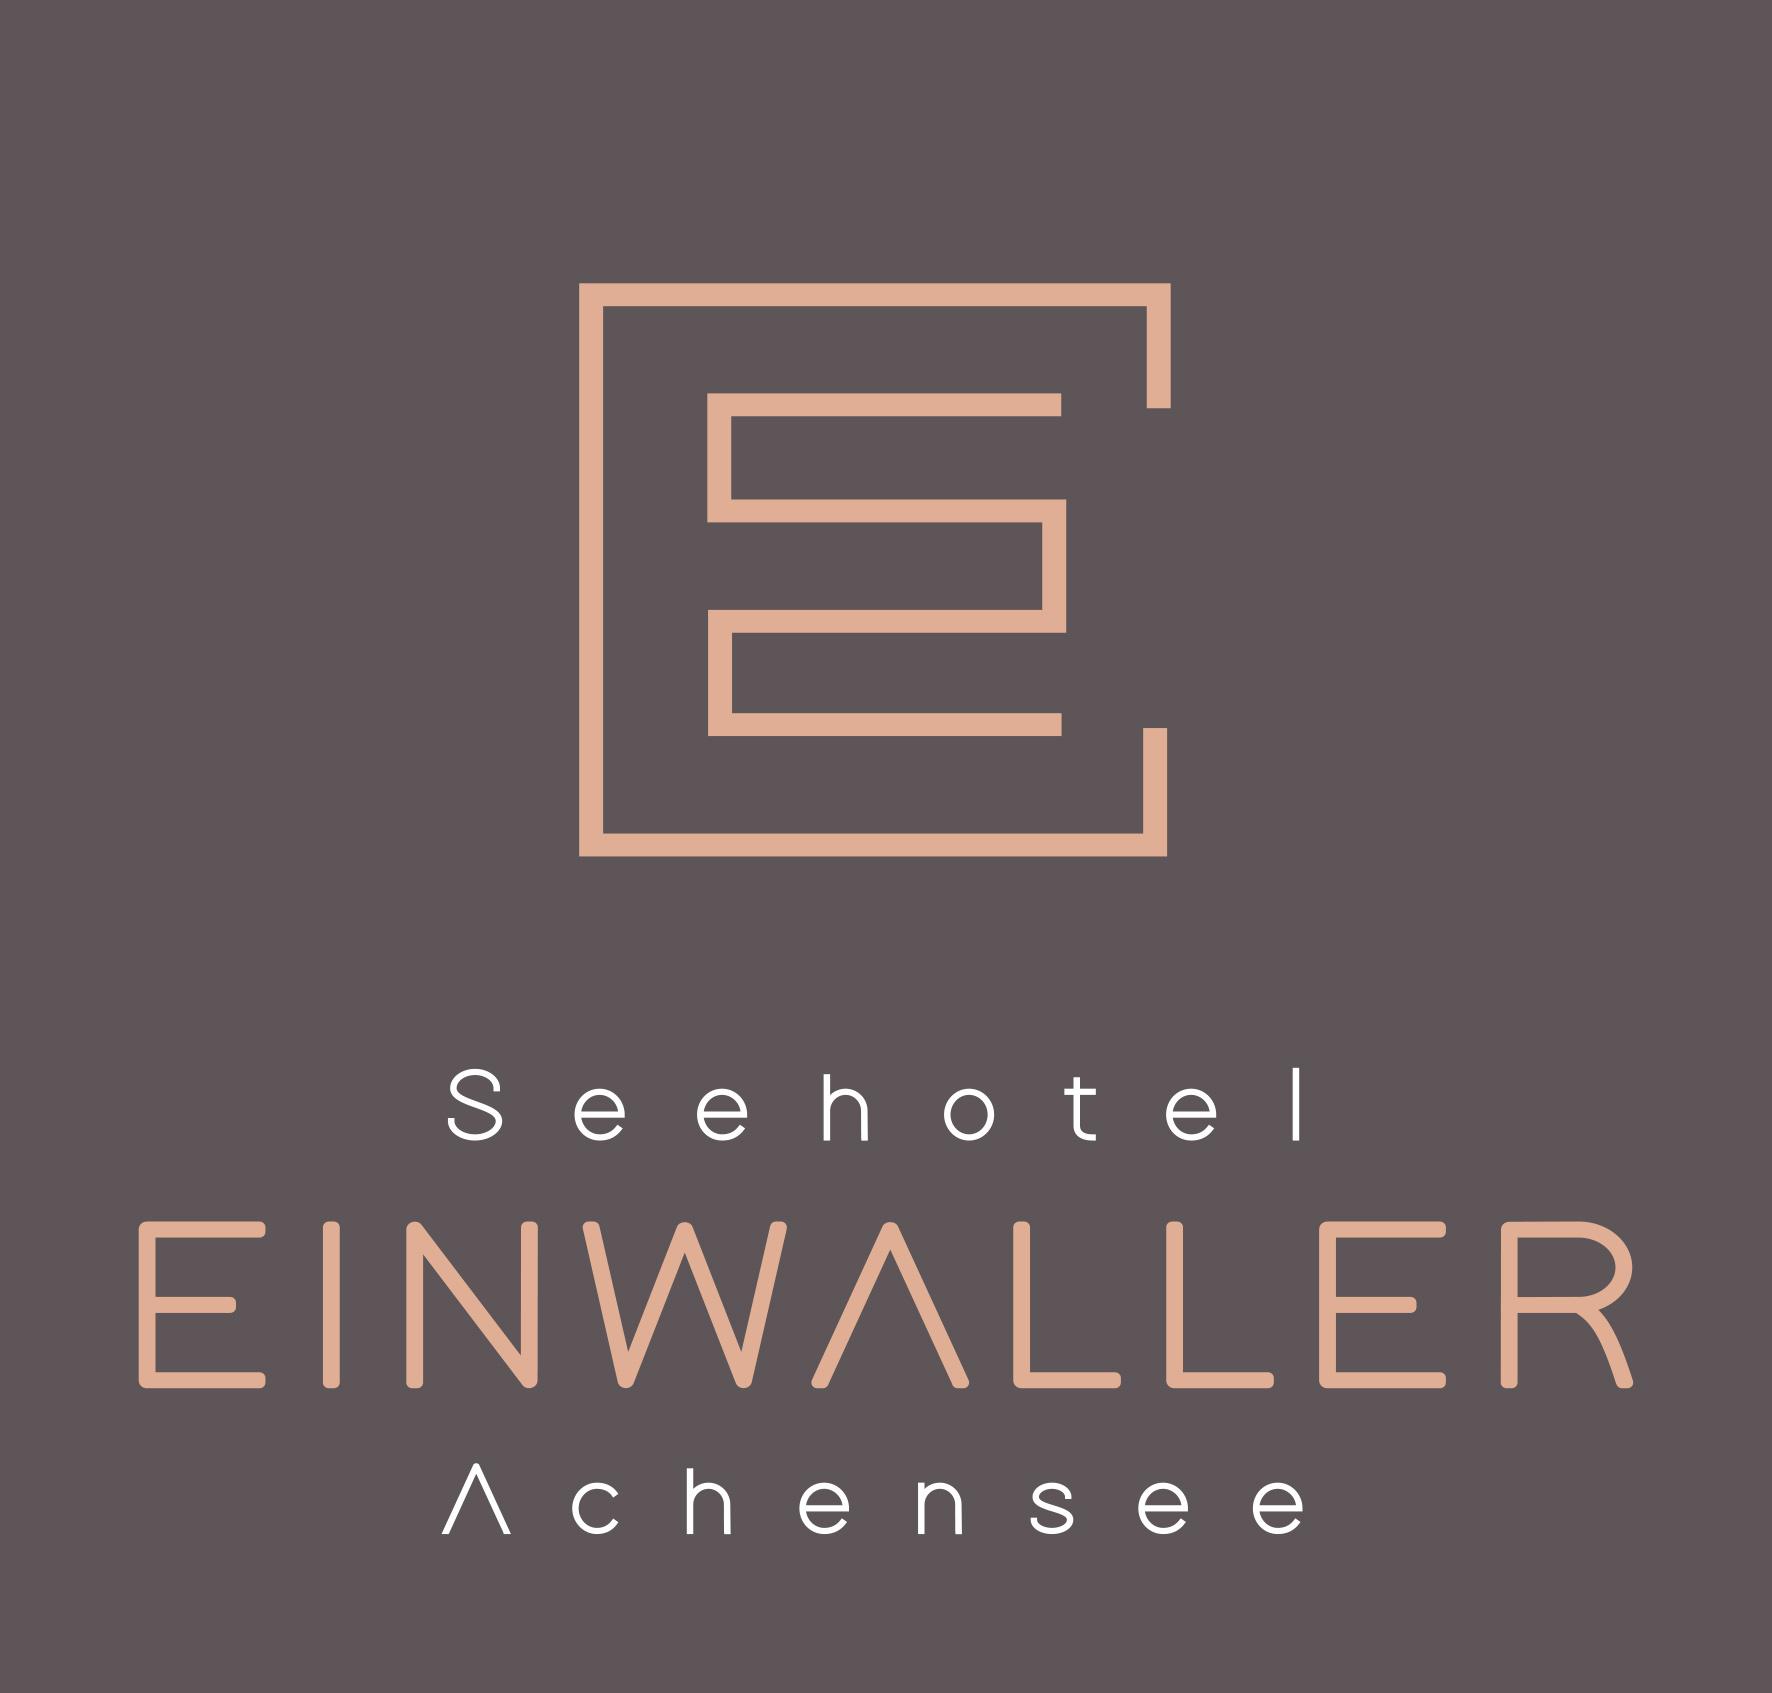 Seehotel Einwaller